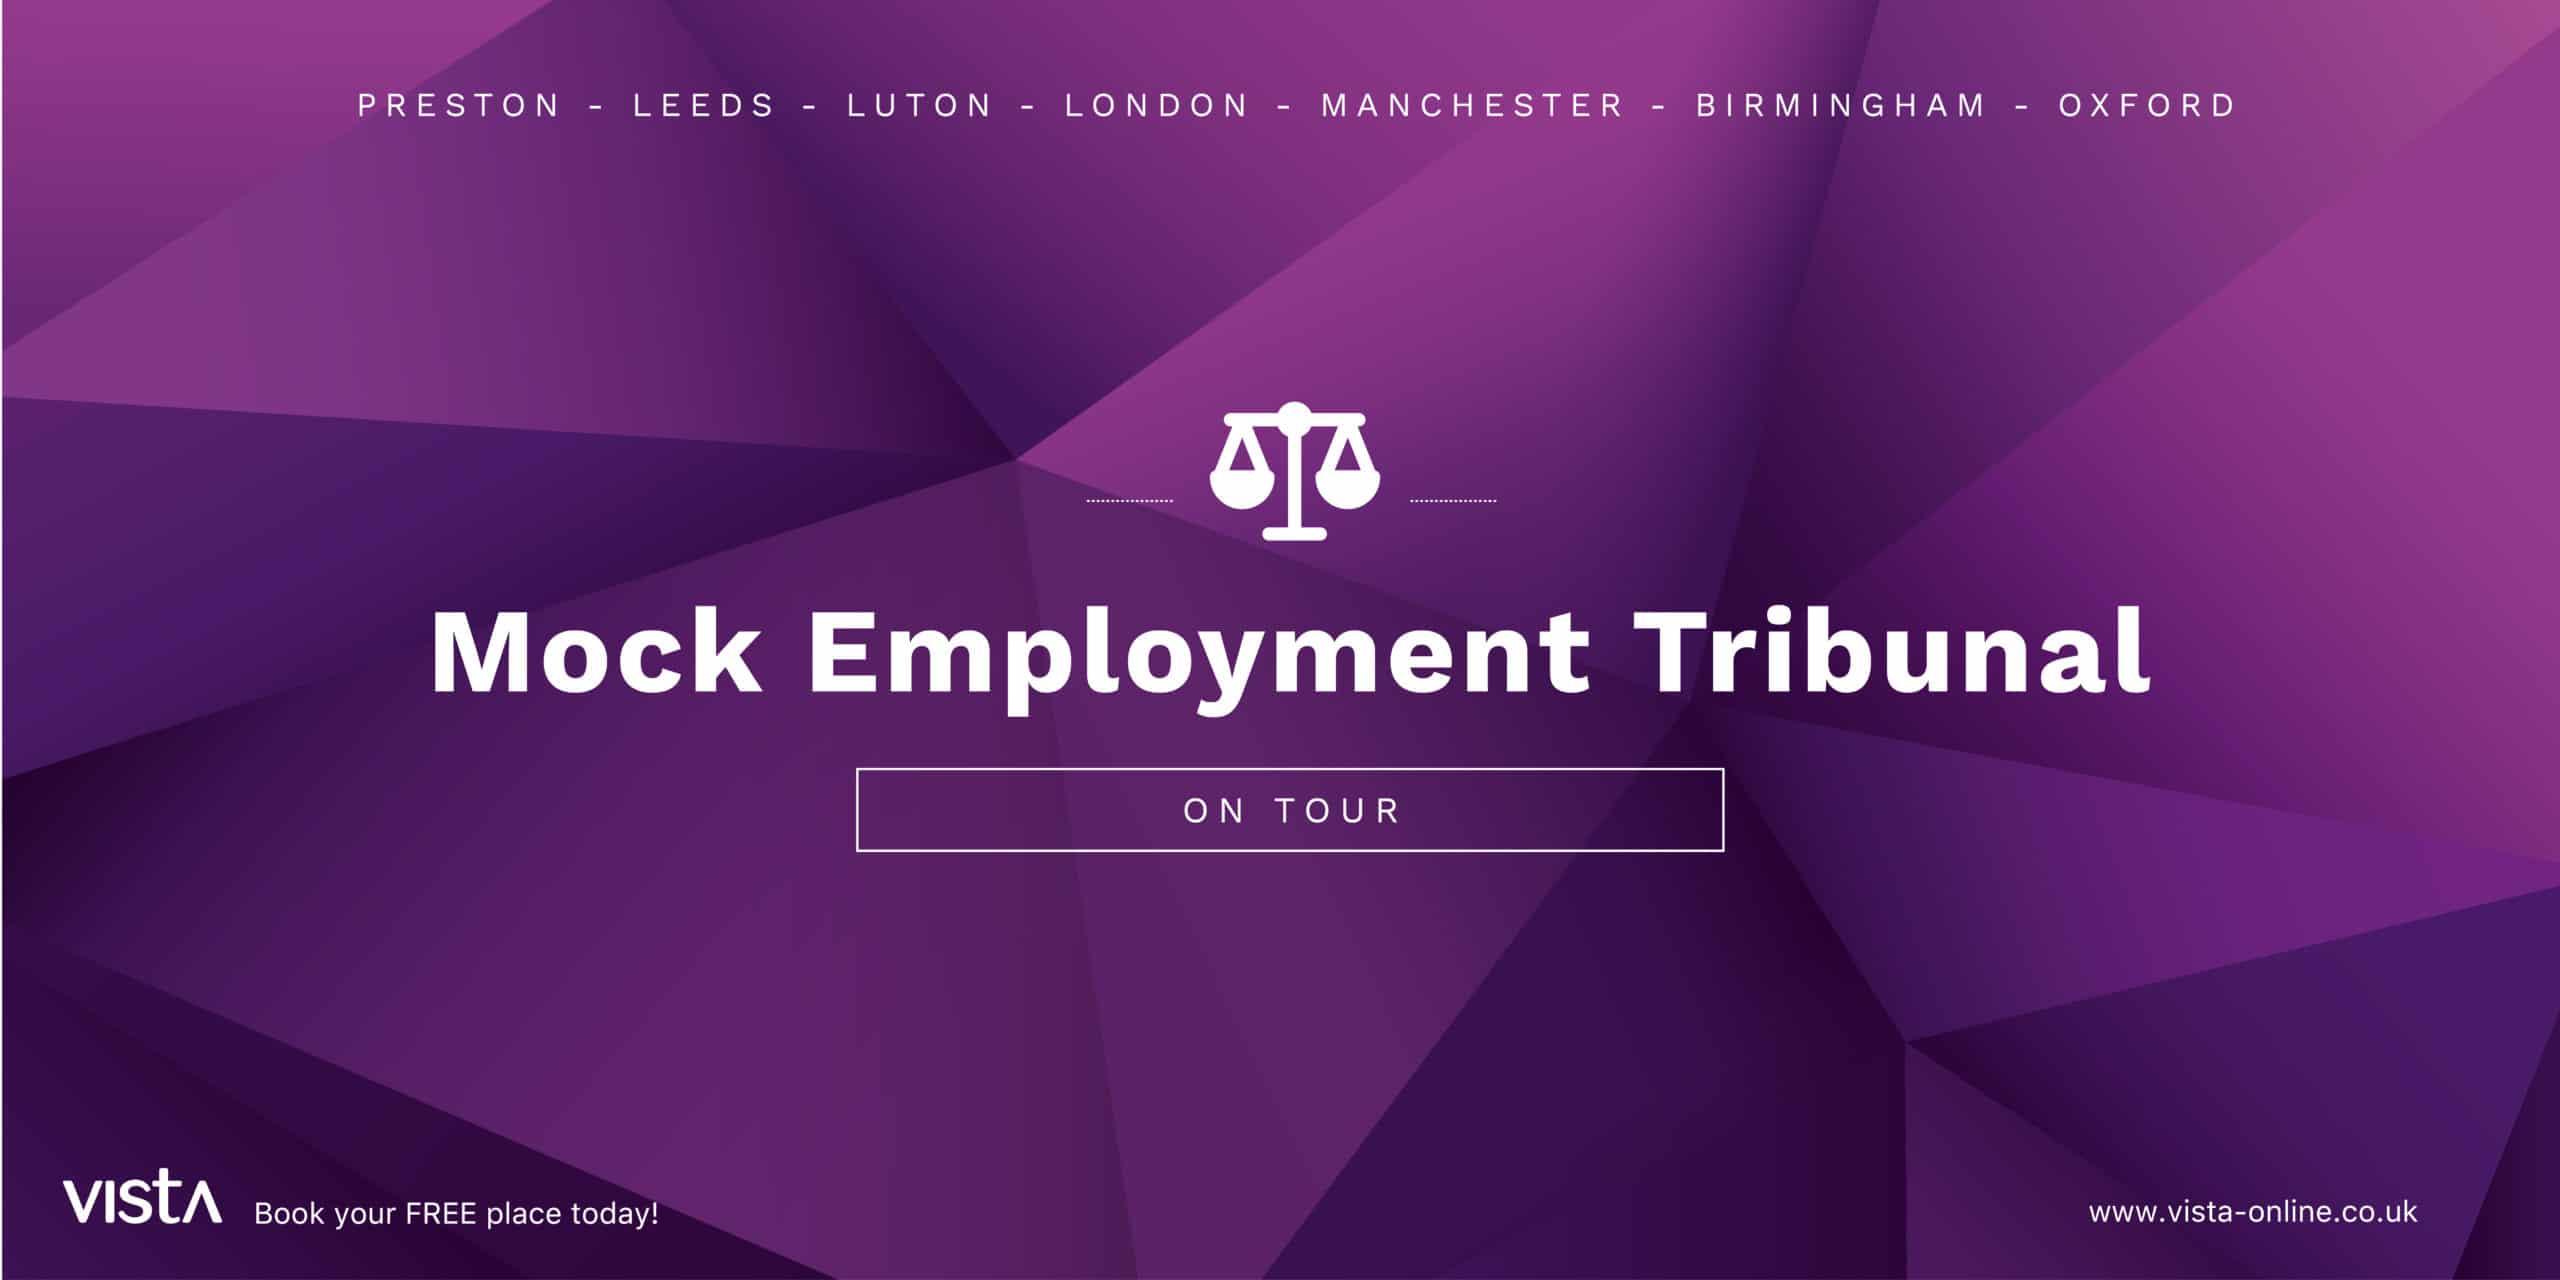 mock-employment-tribunal-tour